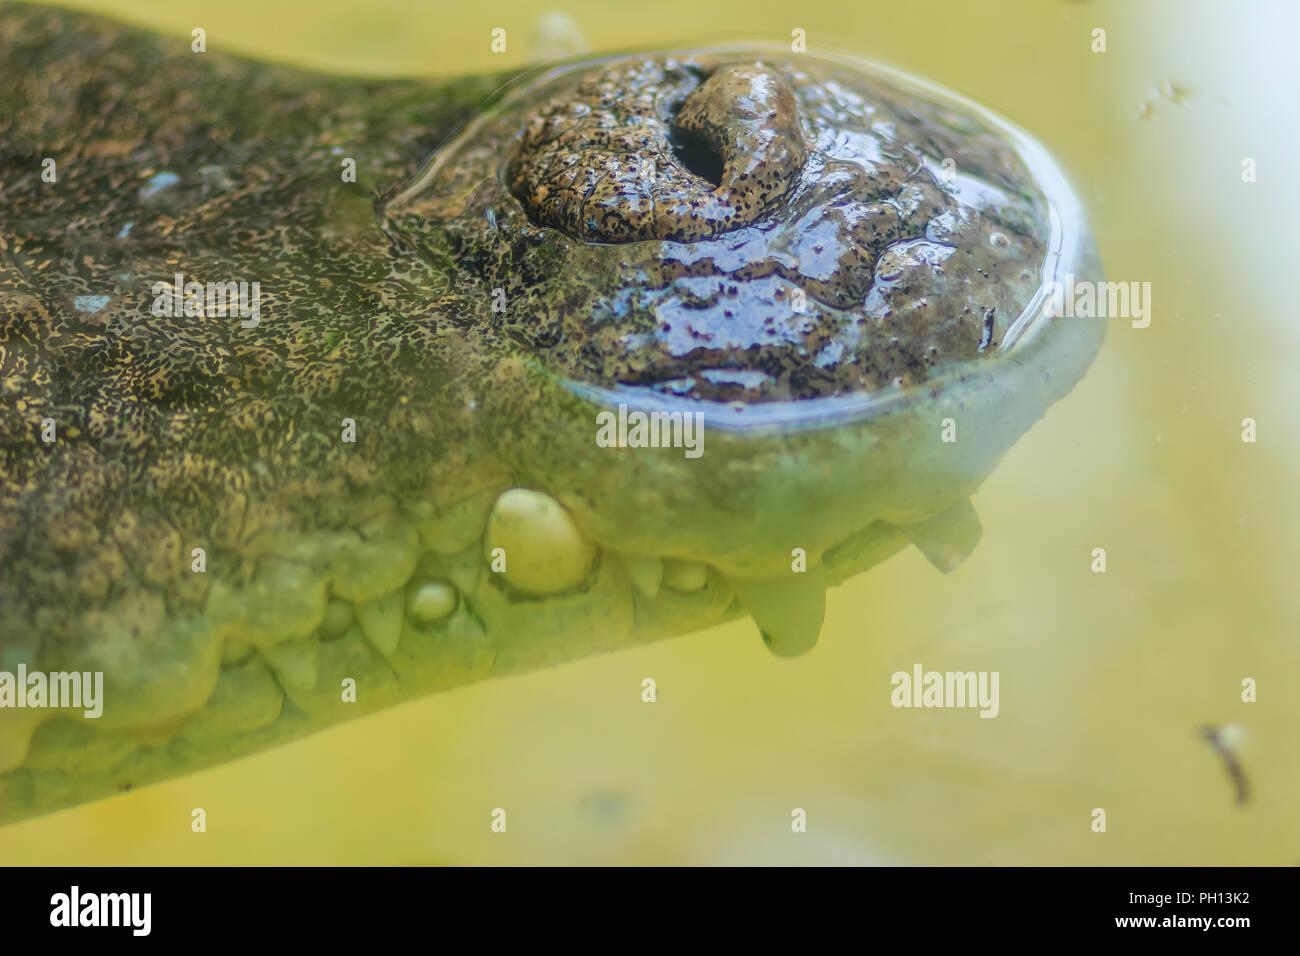 Nose of Saltwater or Estuarine Crocodile (crocodylus porosus) in the water - Stock Image